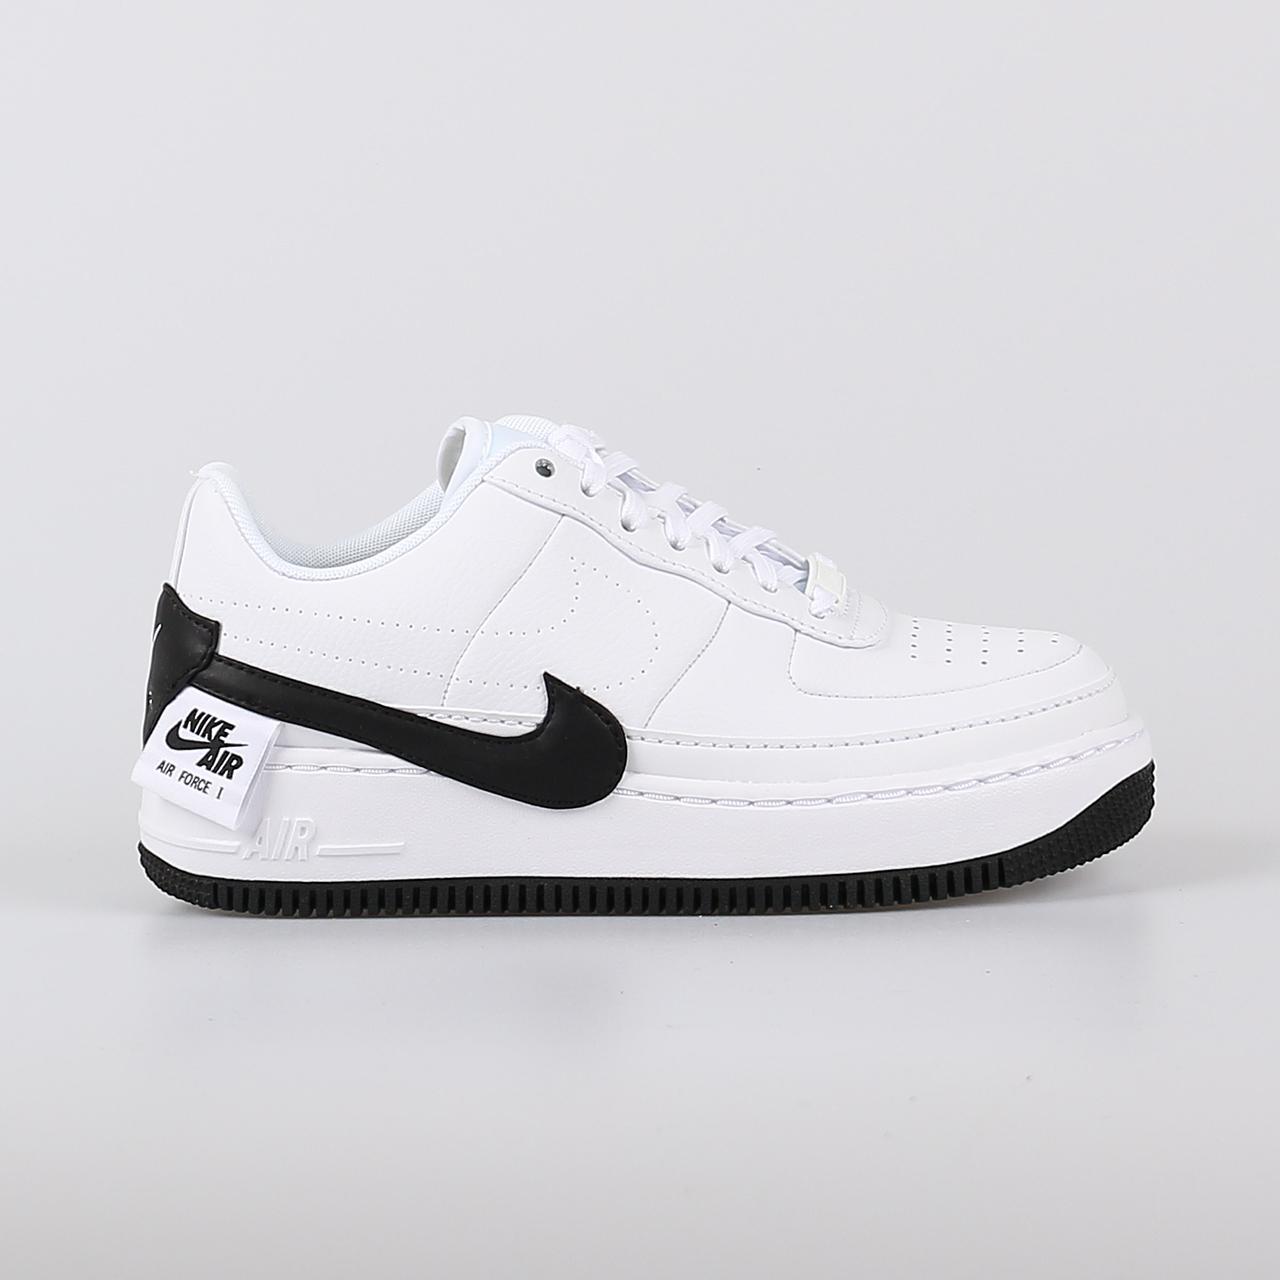 e5421fa0e36 Home / Sneakers / NIKE Air Force 1 Jester x Sneakers Dames